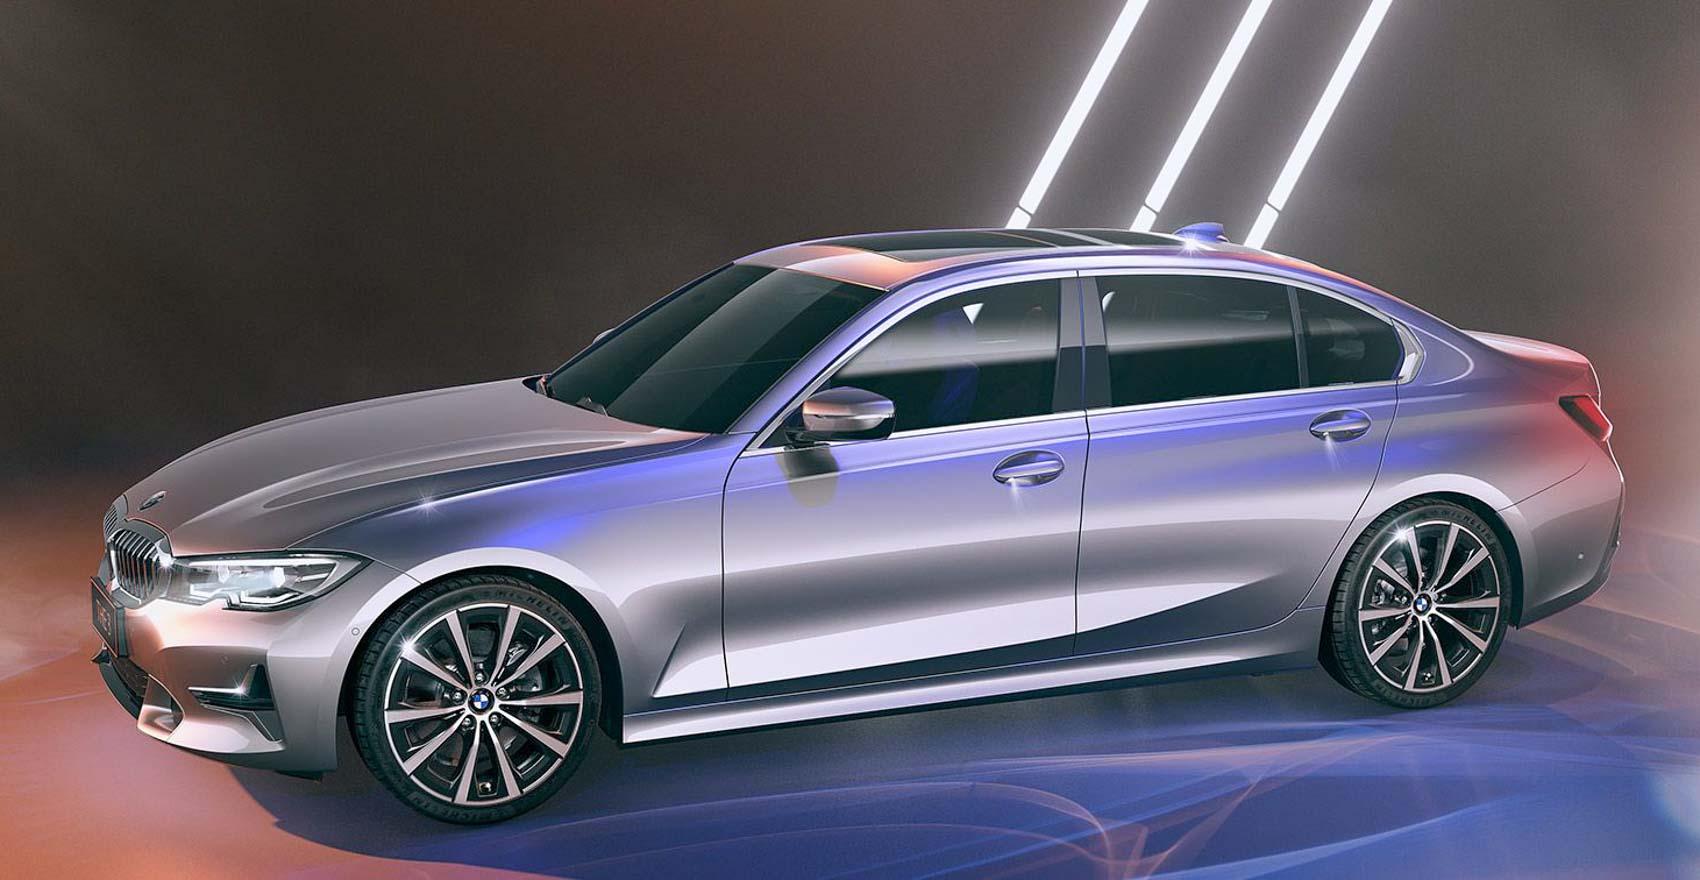 BMW Narrows Gap To Mercedes In Feb 2021 In India; Just 23 Units Shy - GaadiWaadi.com